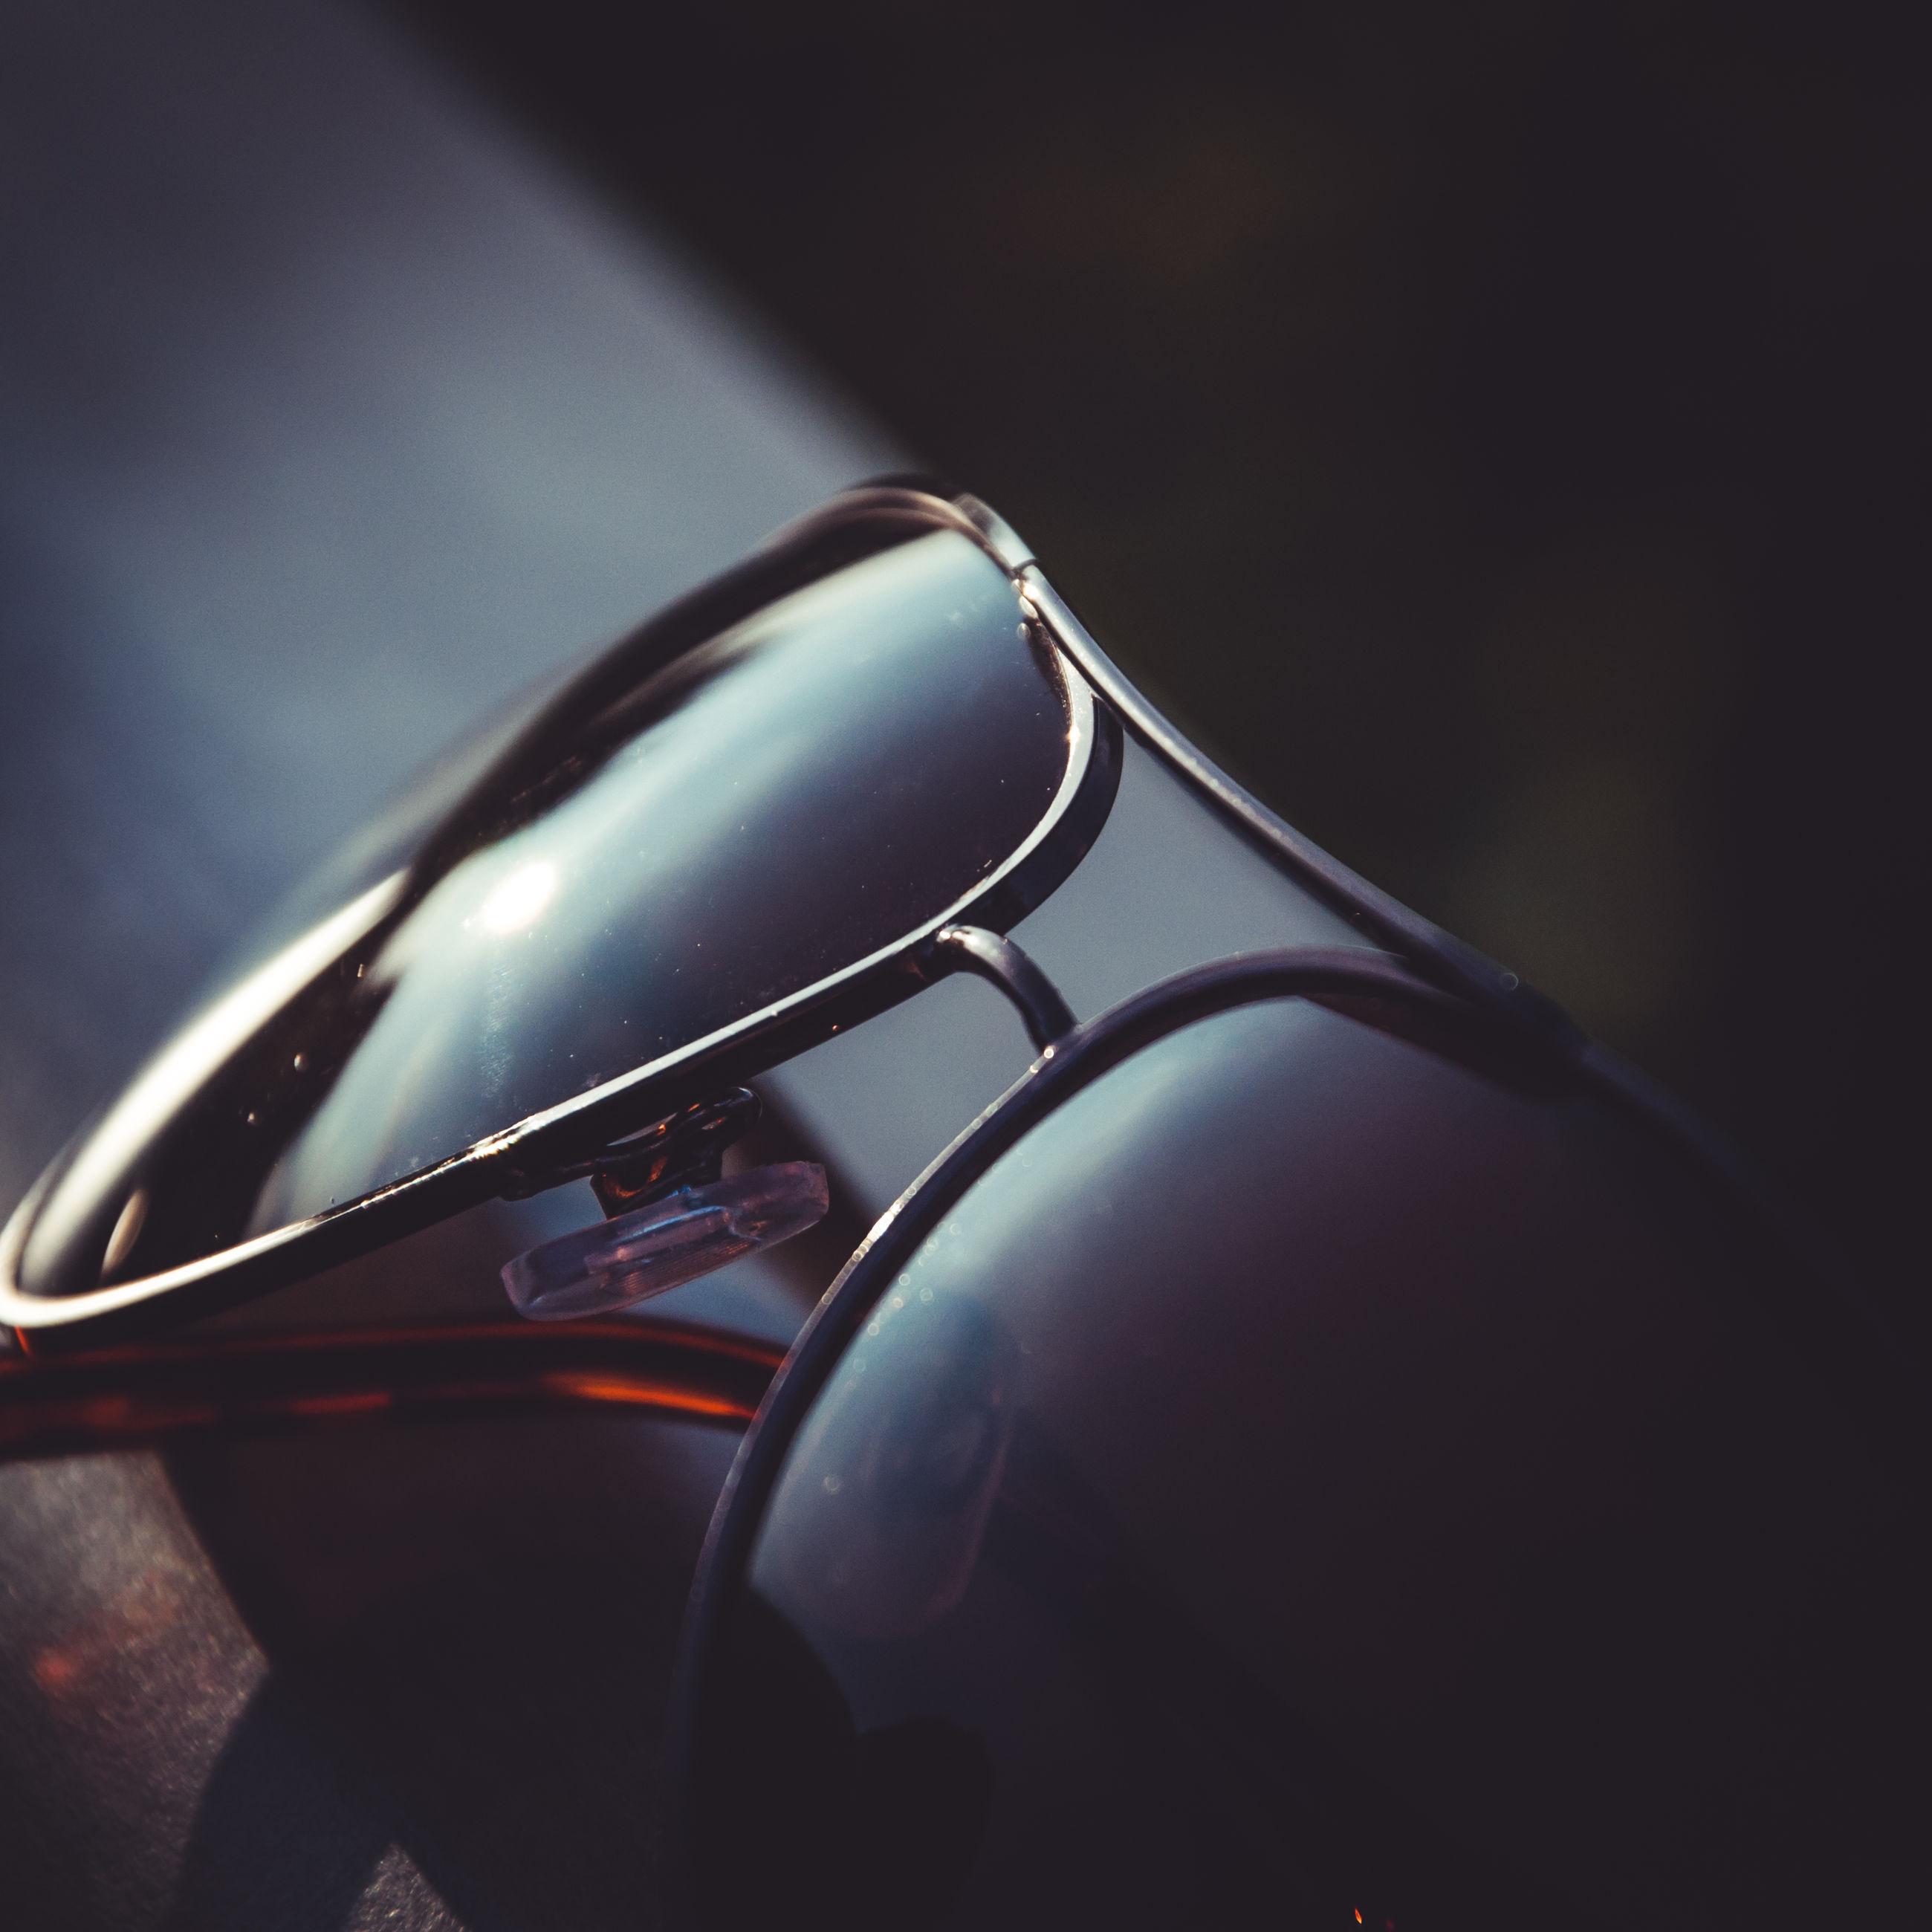 CLOSE-UP OF CAR HEADLIGHT